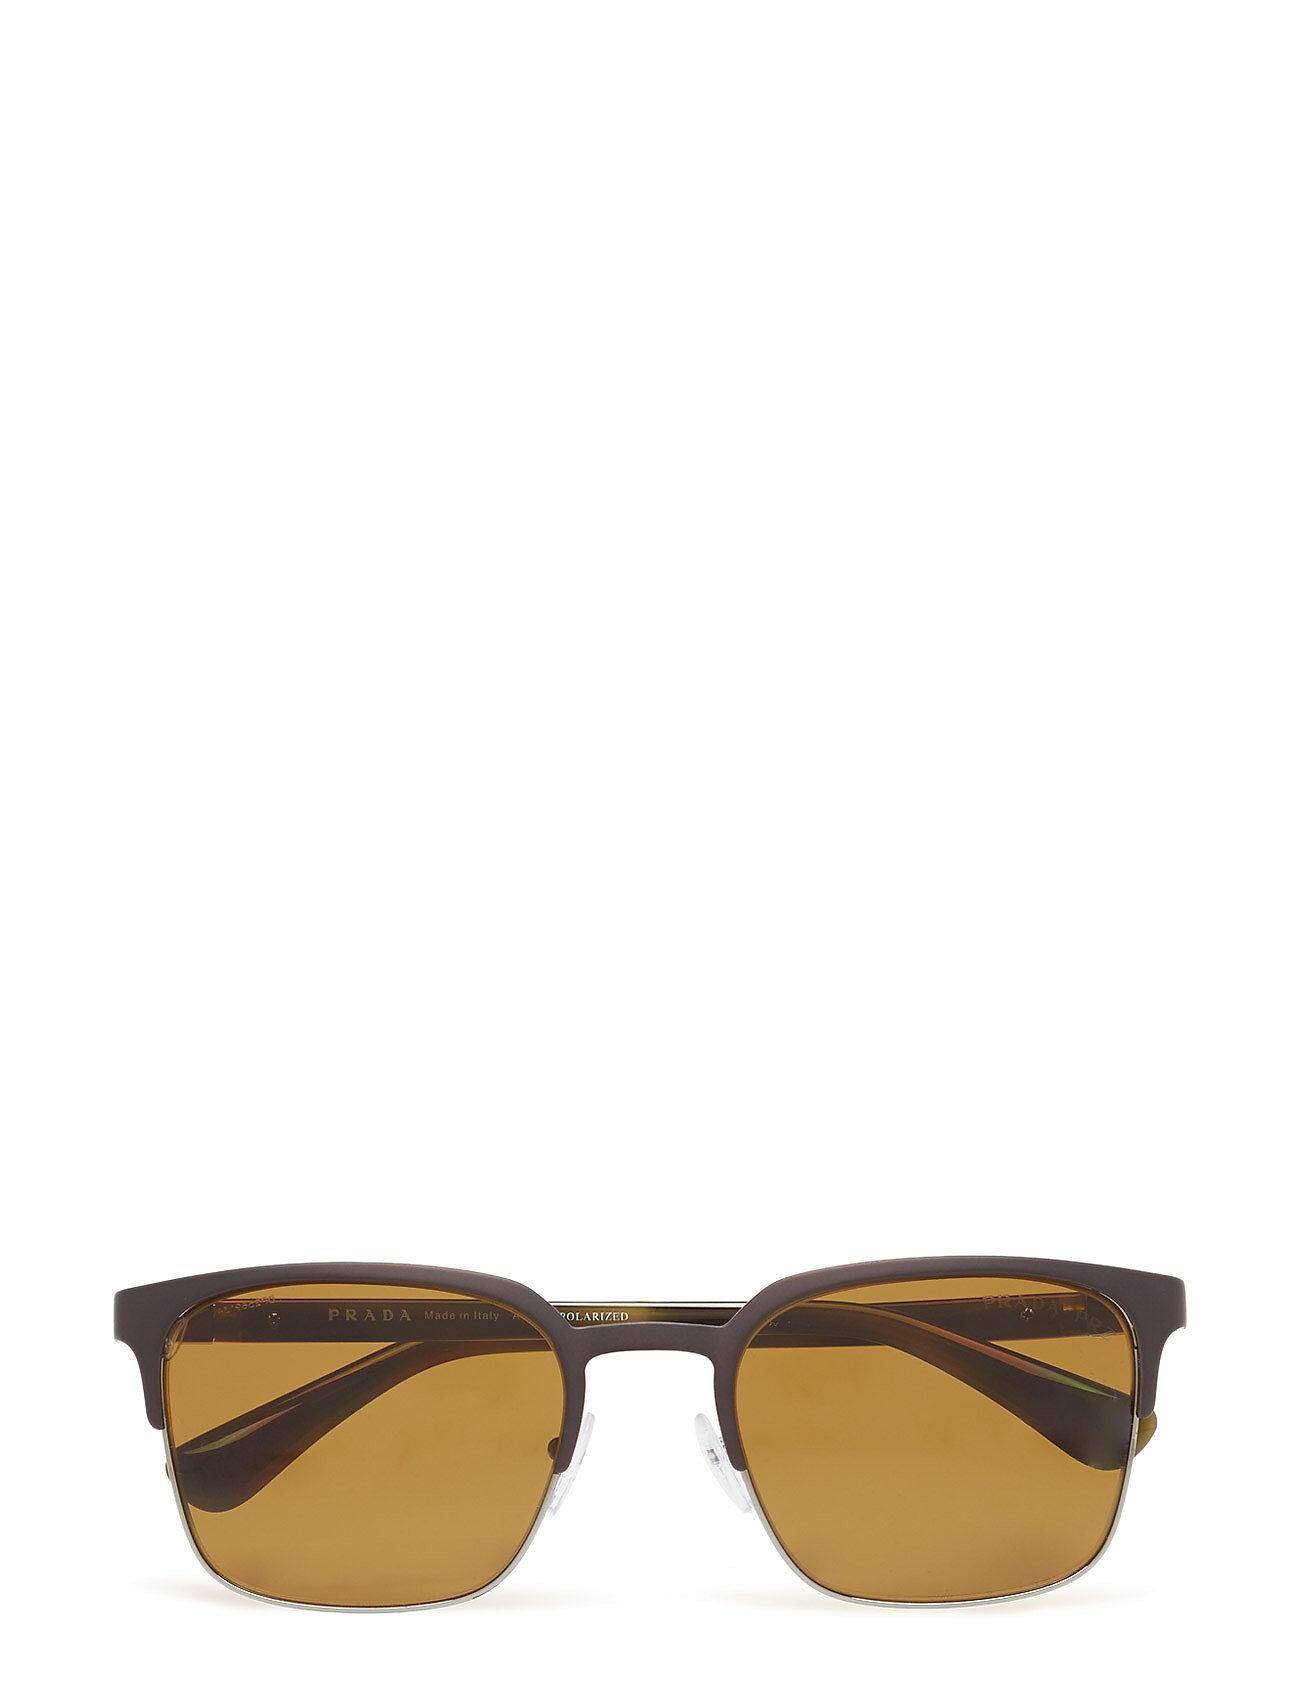 Image of Prada Sunglasses Heritage Wayfarer Aurinkolasit Ruskea